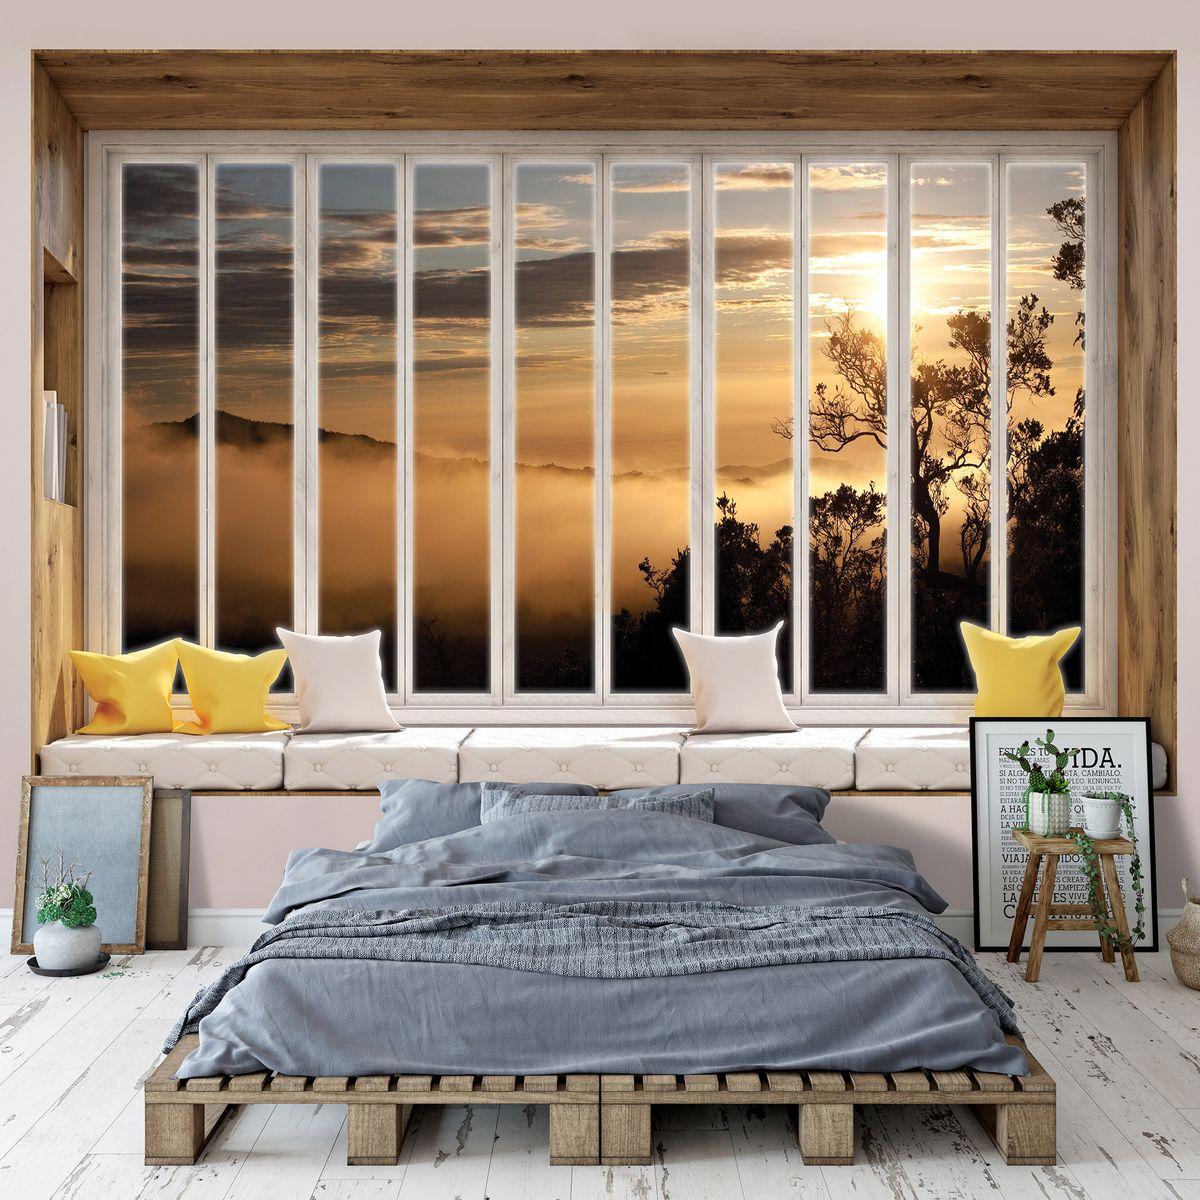 Fototapeta - Hory zahalené v mlze - okno (T030446T1525104B)